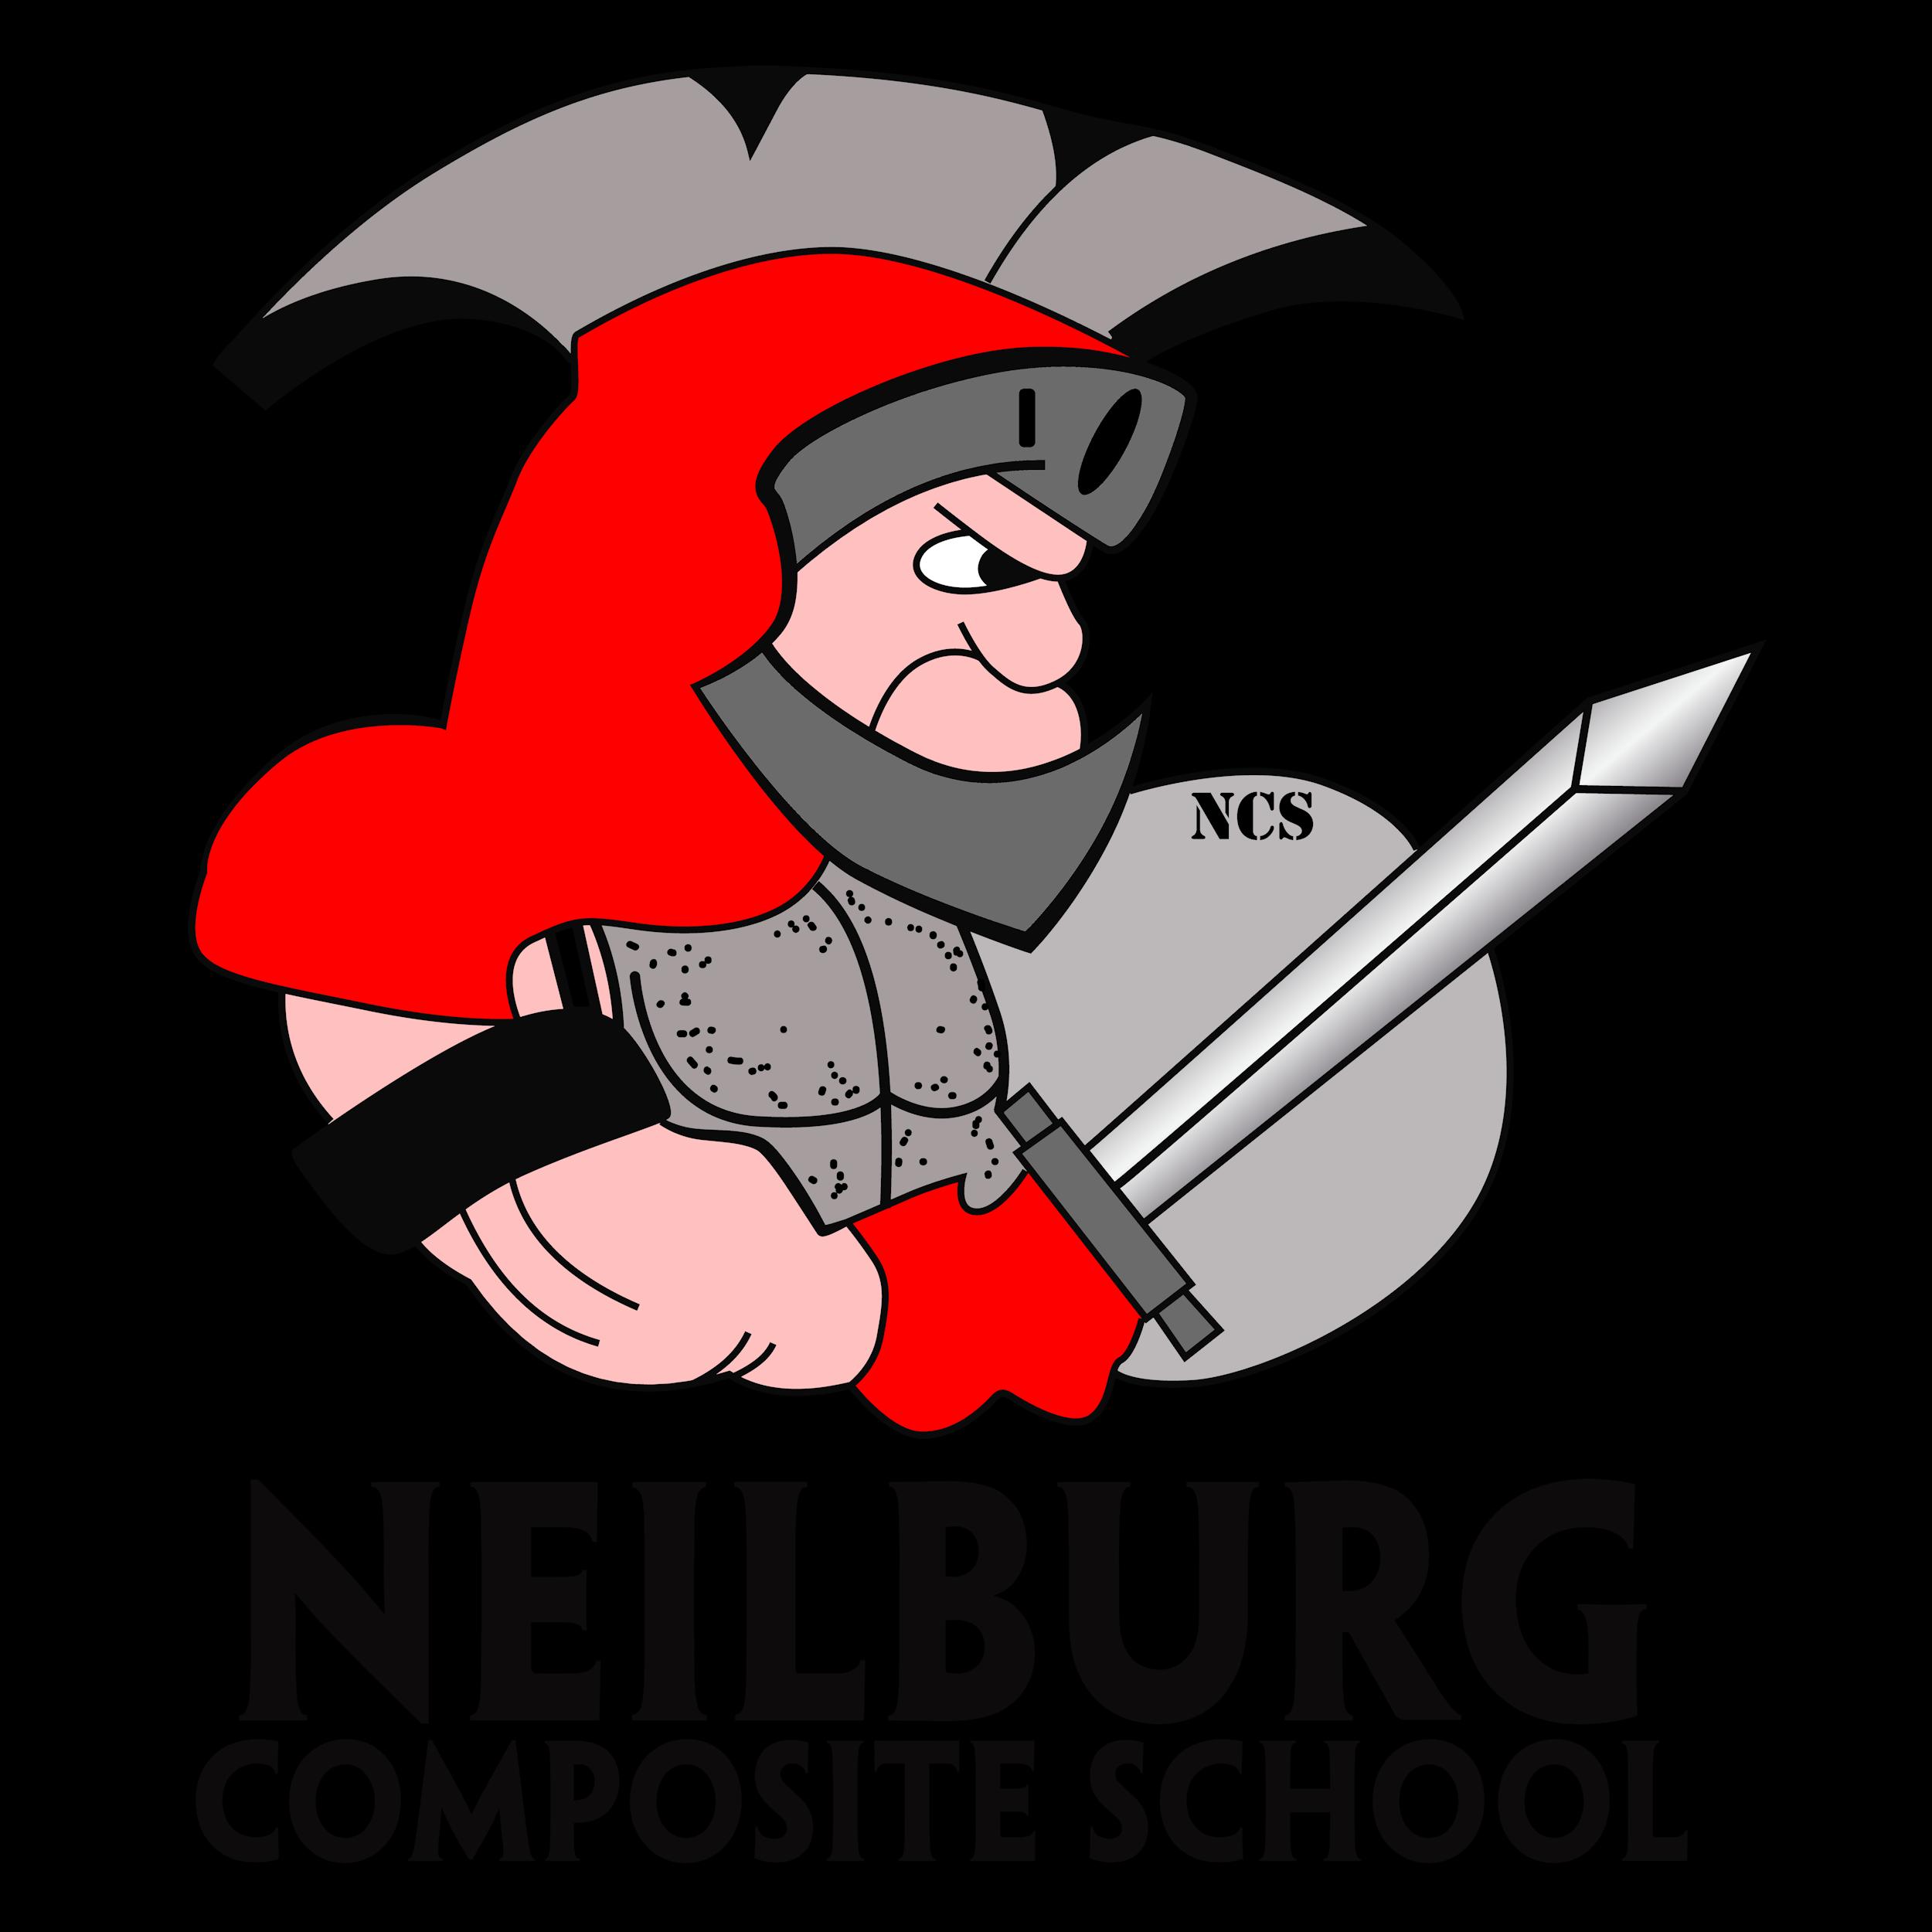 Welcome to our school clipart image transparent library Neilburg Composite School - Neilburg Composite School image transparent library